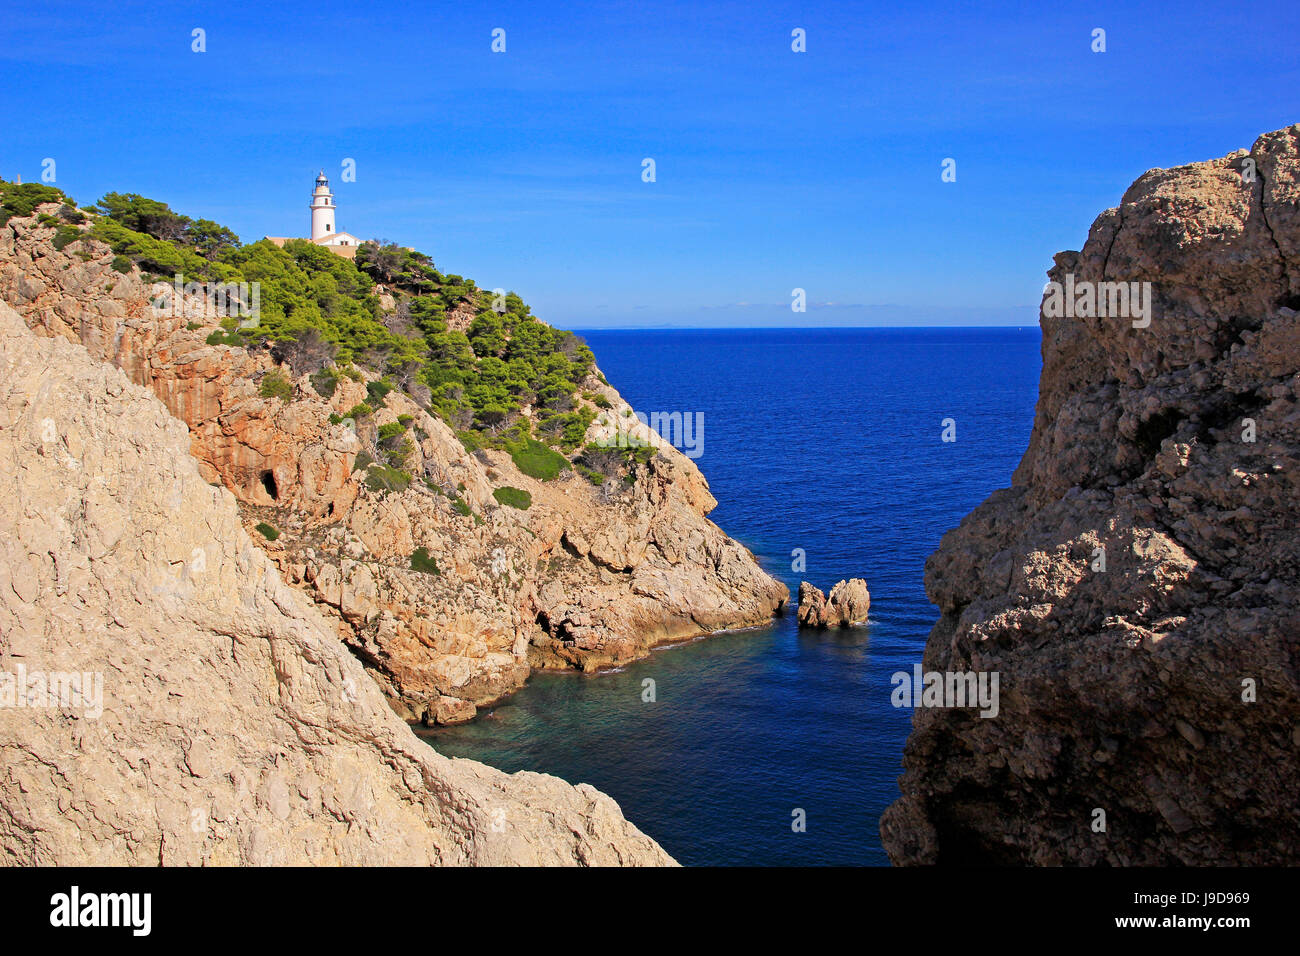 Lighthouse at Cap de Pera near Cala Ratjada, Majorca, Balearic Islands, Spain, Mediterranean, Europe - Stock Image